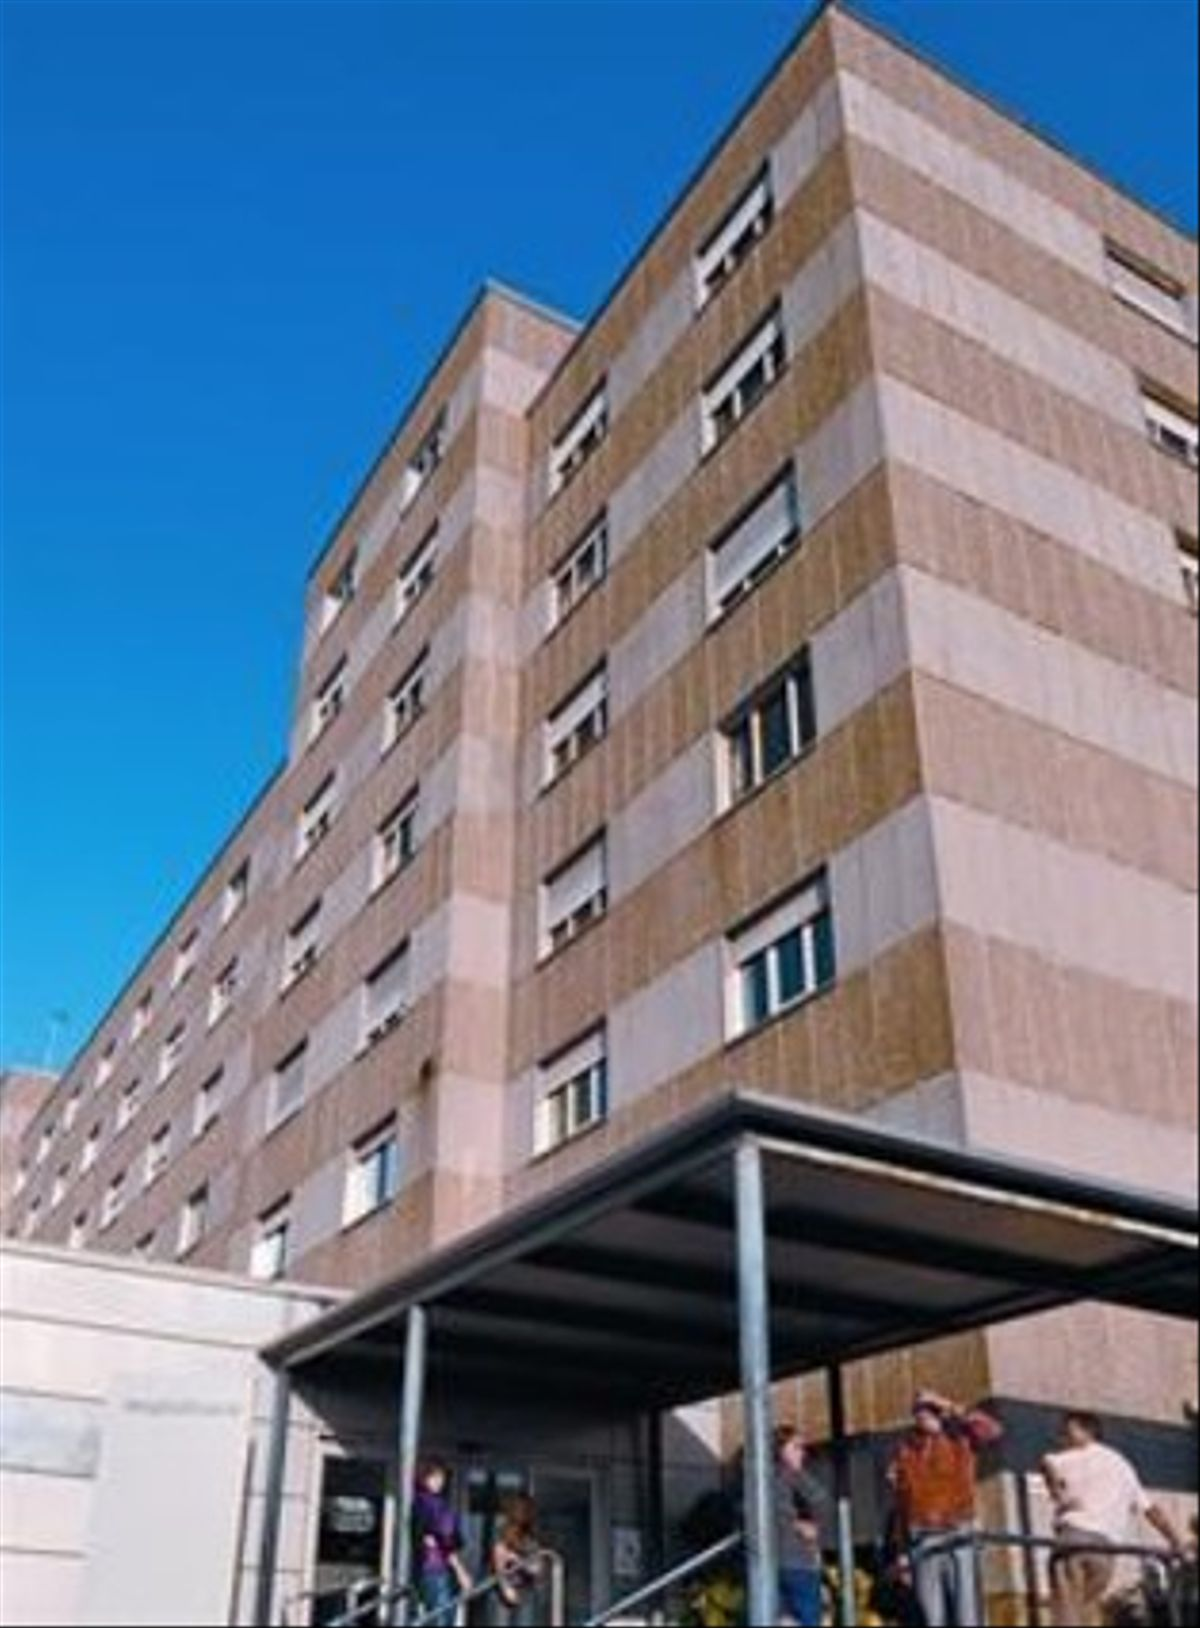 Entrada del Hospital General de Granollers, ayer.